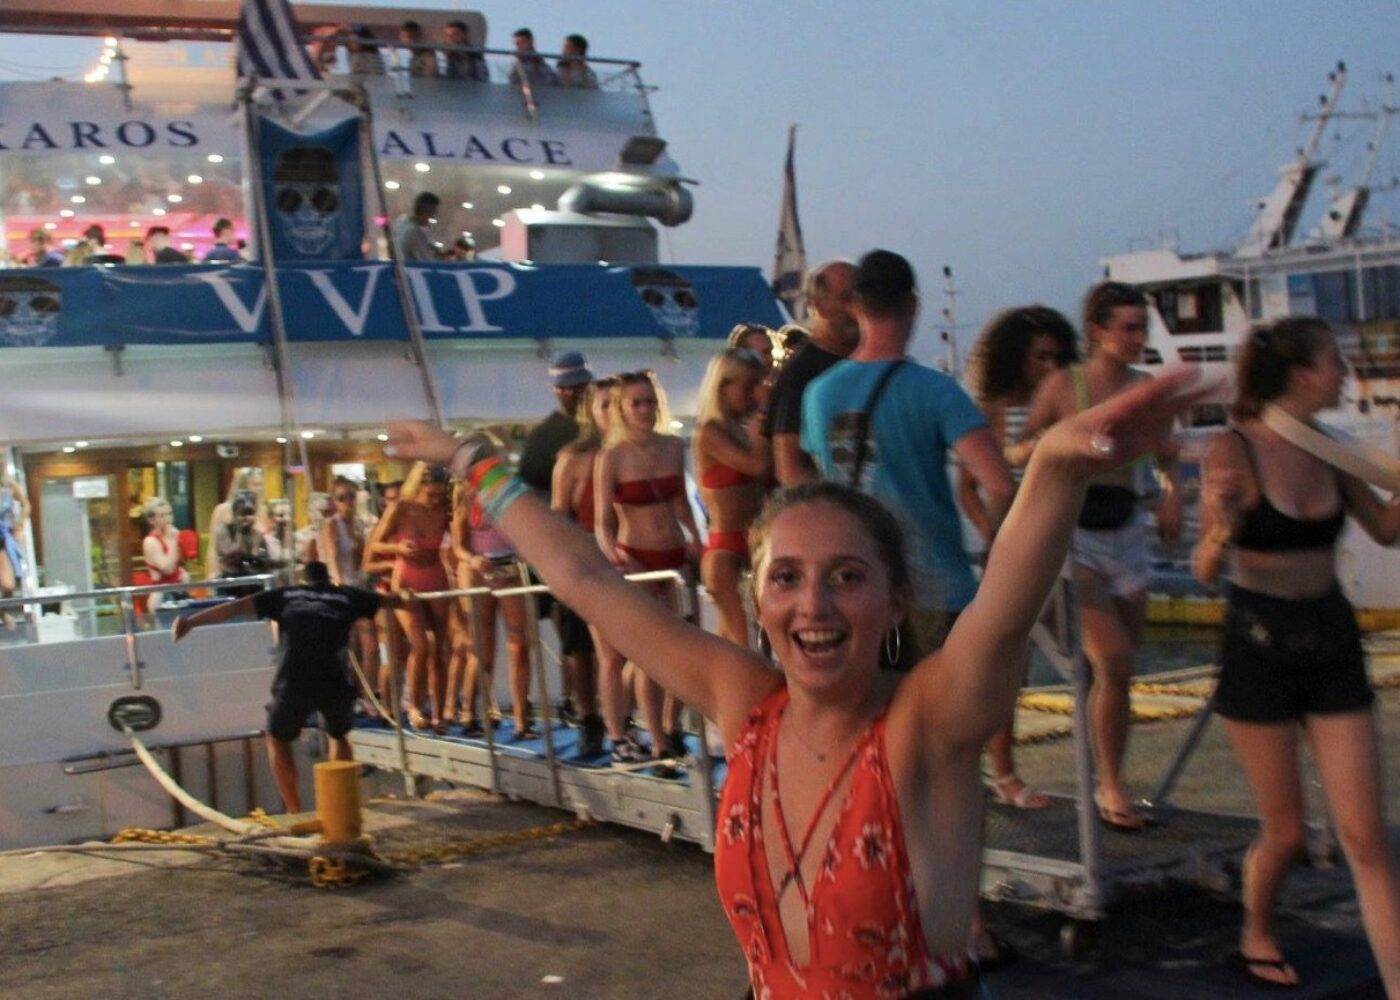 vvip-boat-party